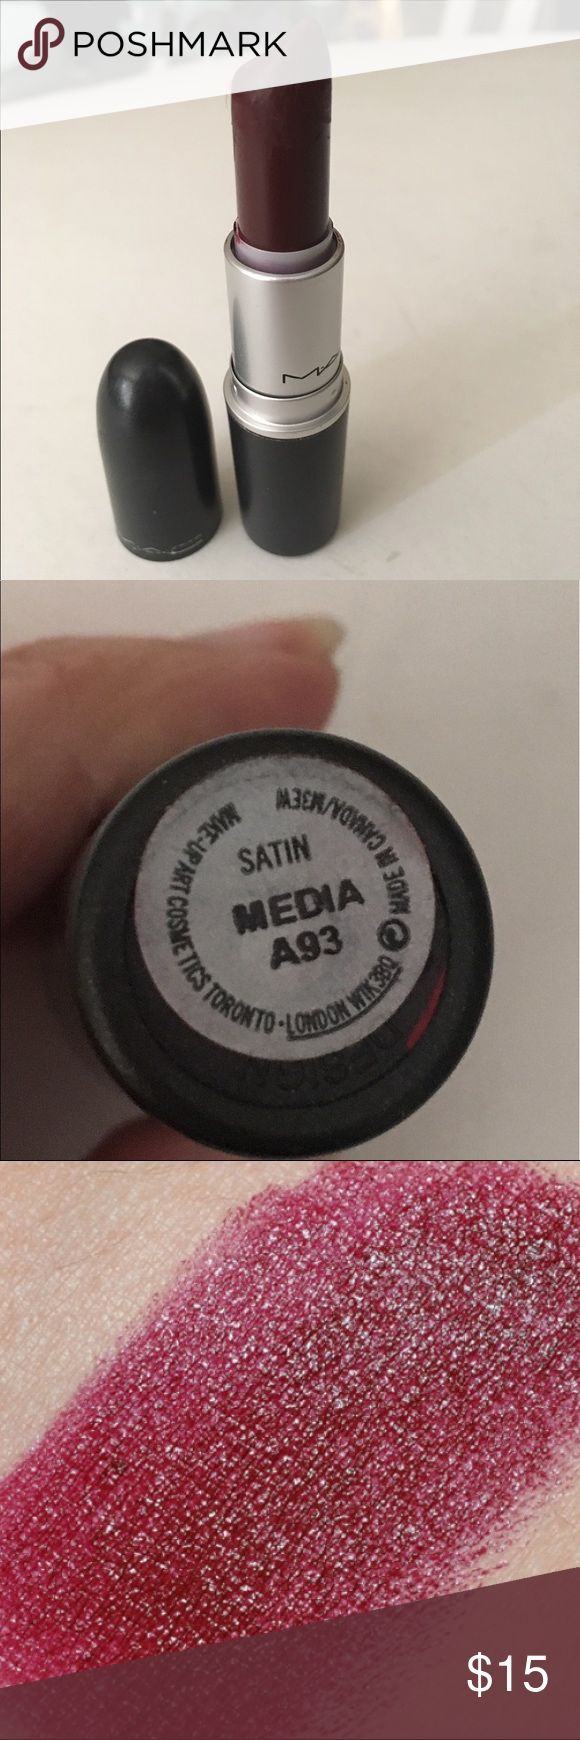 MAC Media Lipstick - Satin finish MAC Media Lipstick - Satin finish - Almost full amount remains - sterilized - (* I can't be responsible if Lipsticks melt if left in mailbox*) - sterilized - Fast Shipping Makeup Lipstick